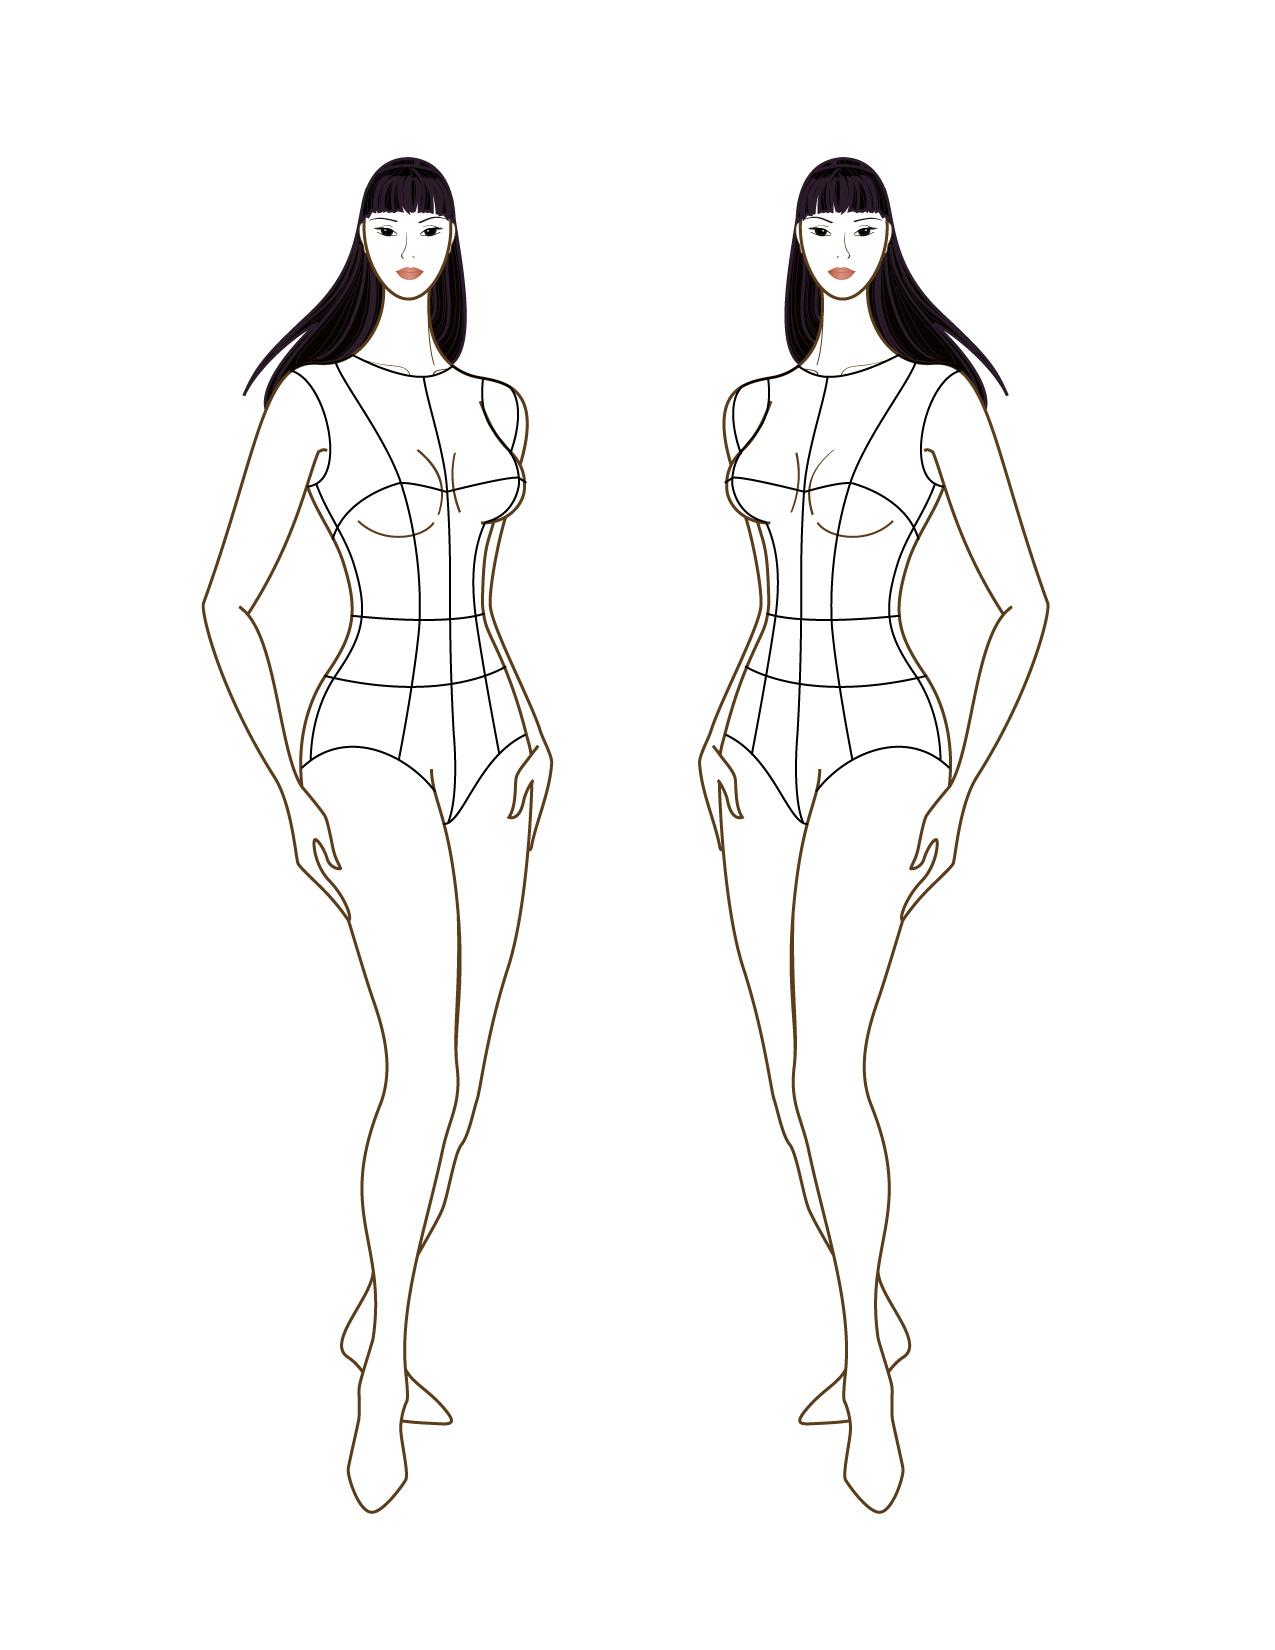 Blank fashion design templates 41